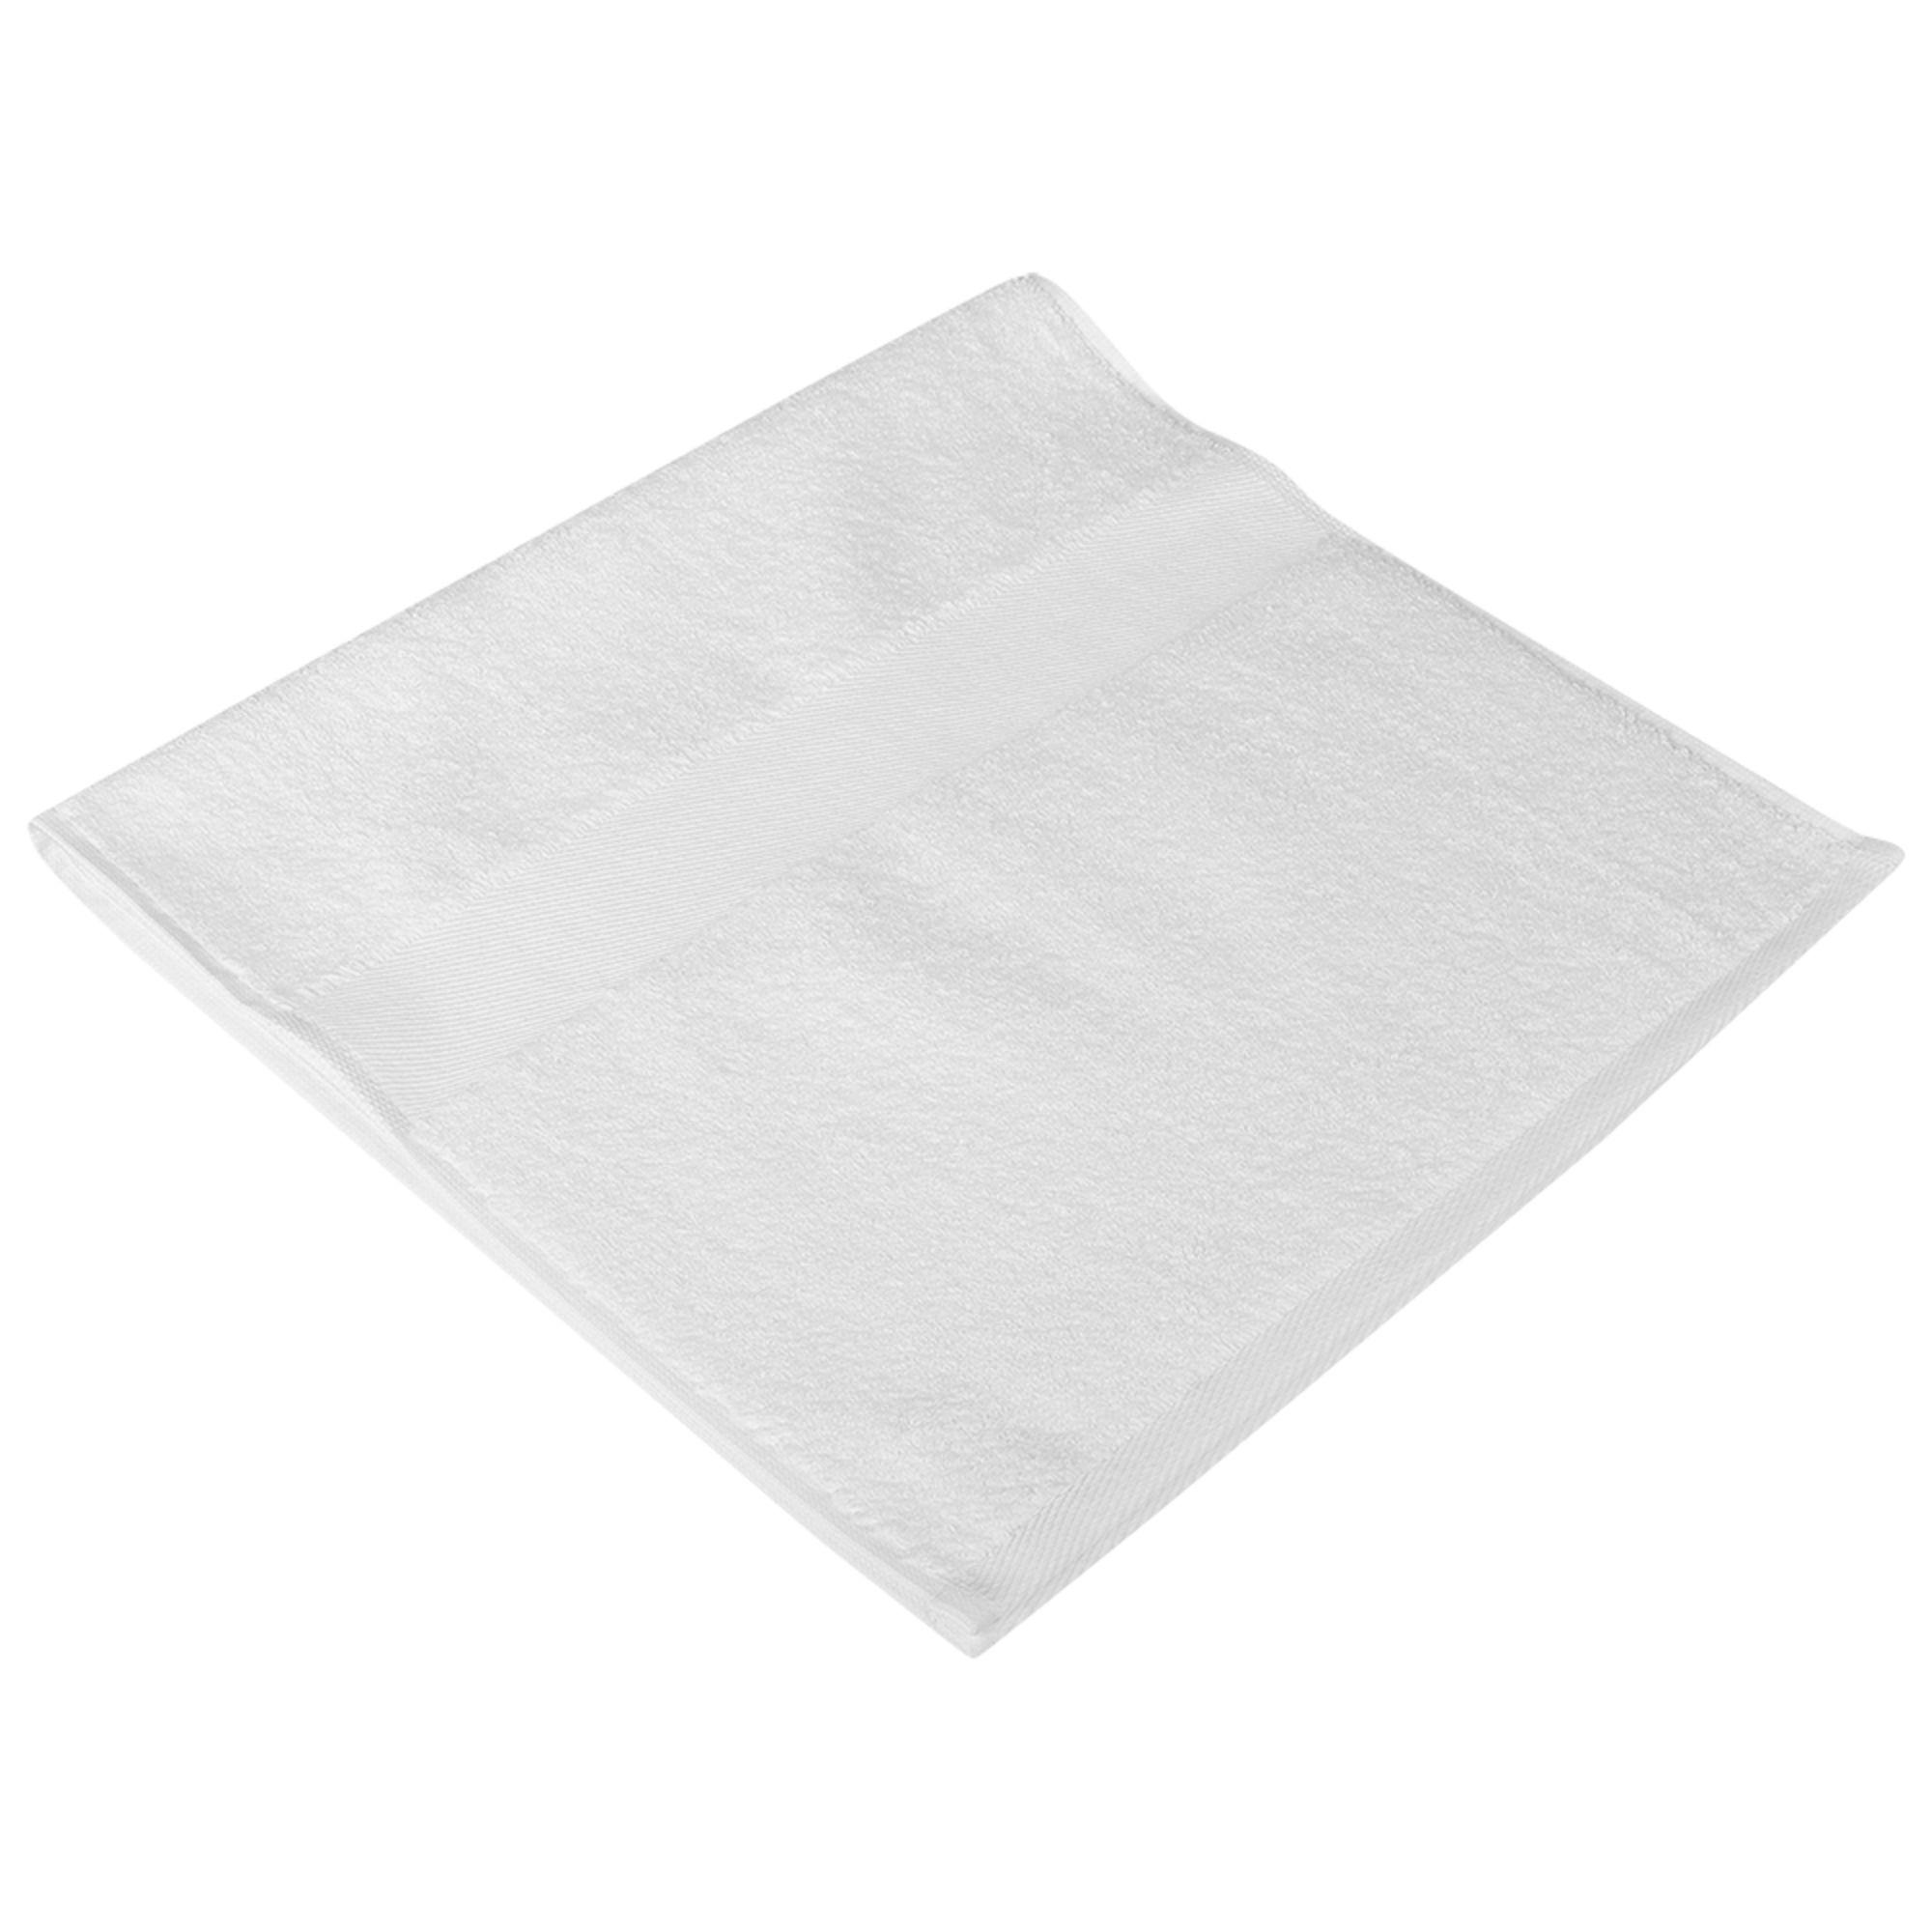 Полотенце махровое Small, белое